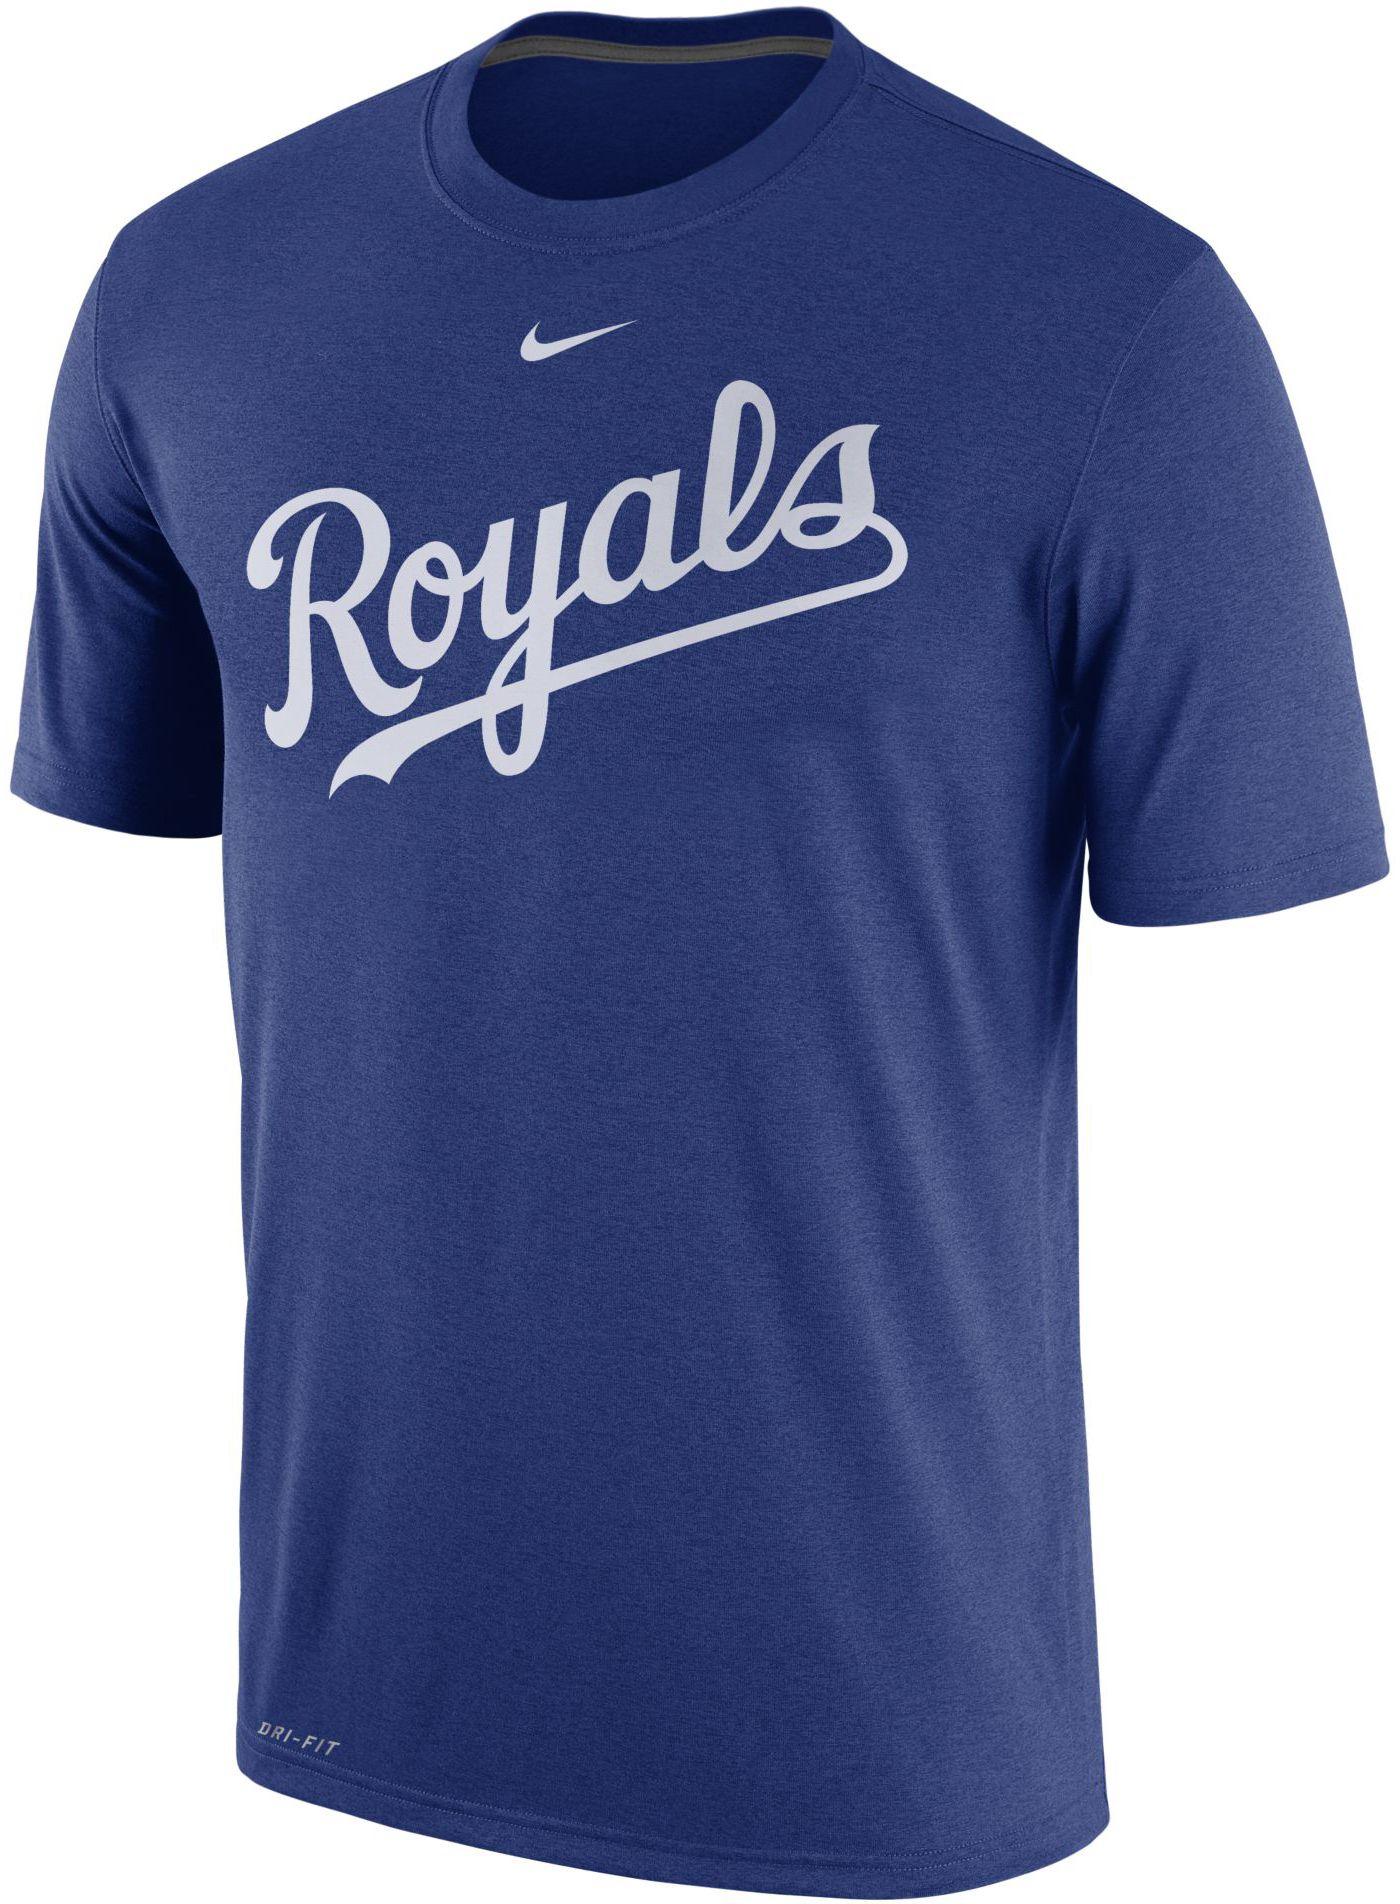 Nike Men's Kansas City Royals Dri-FIT Legend T-Shirt